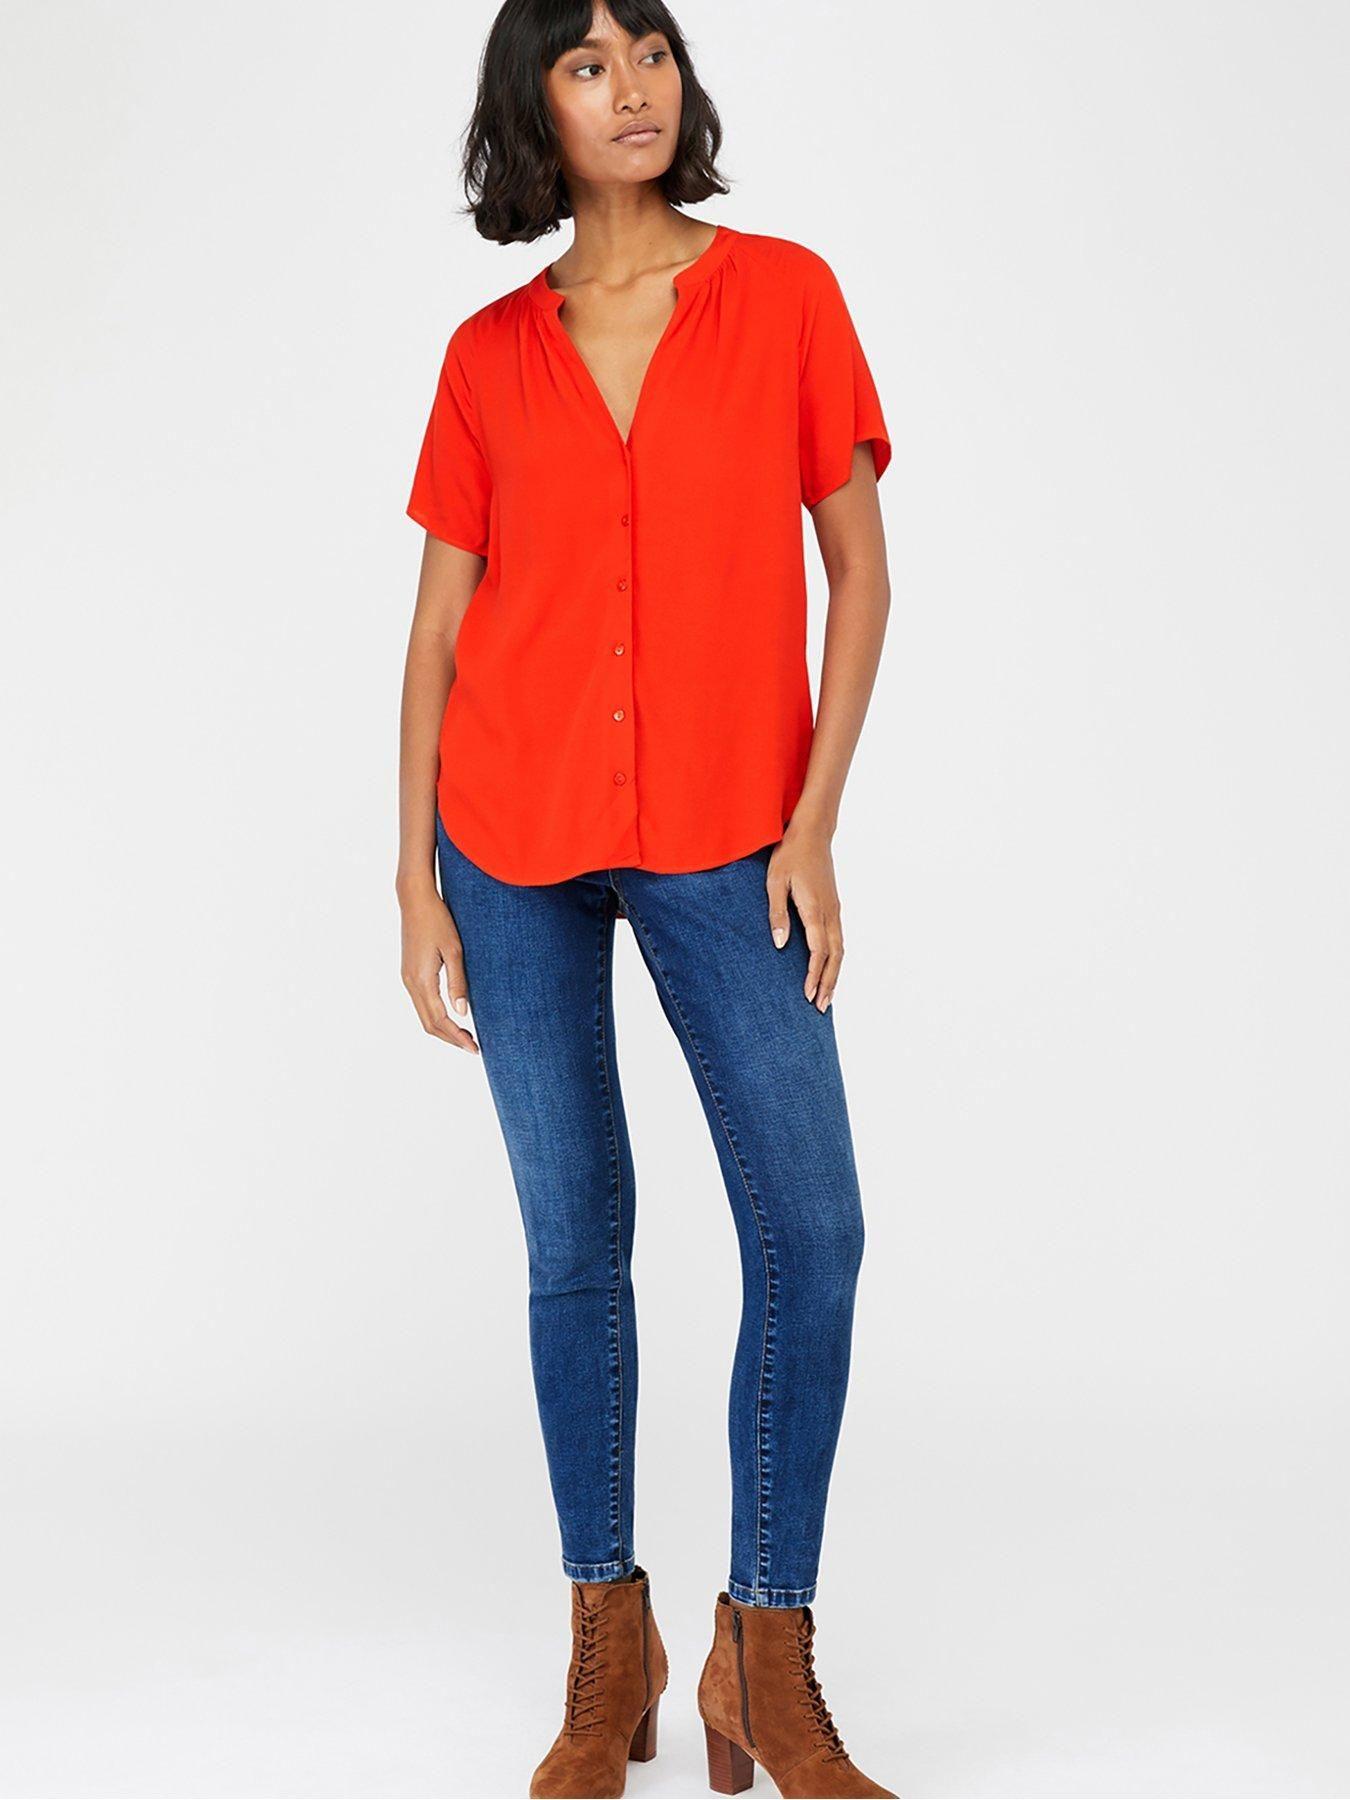 Monsoon Monsoon Zinnia Short Sleeve Blouse, Red, Size 22, Women – Red – 22